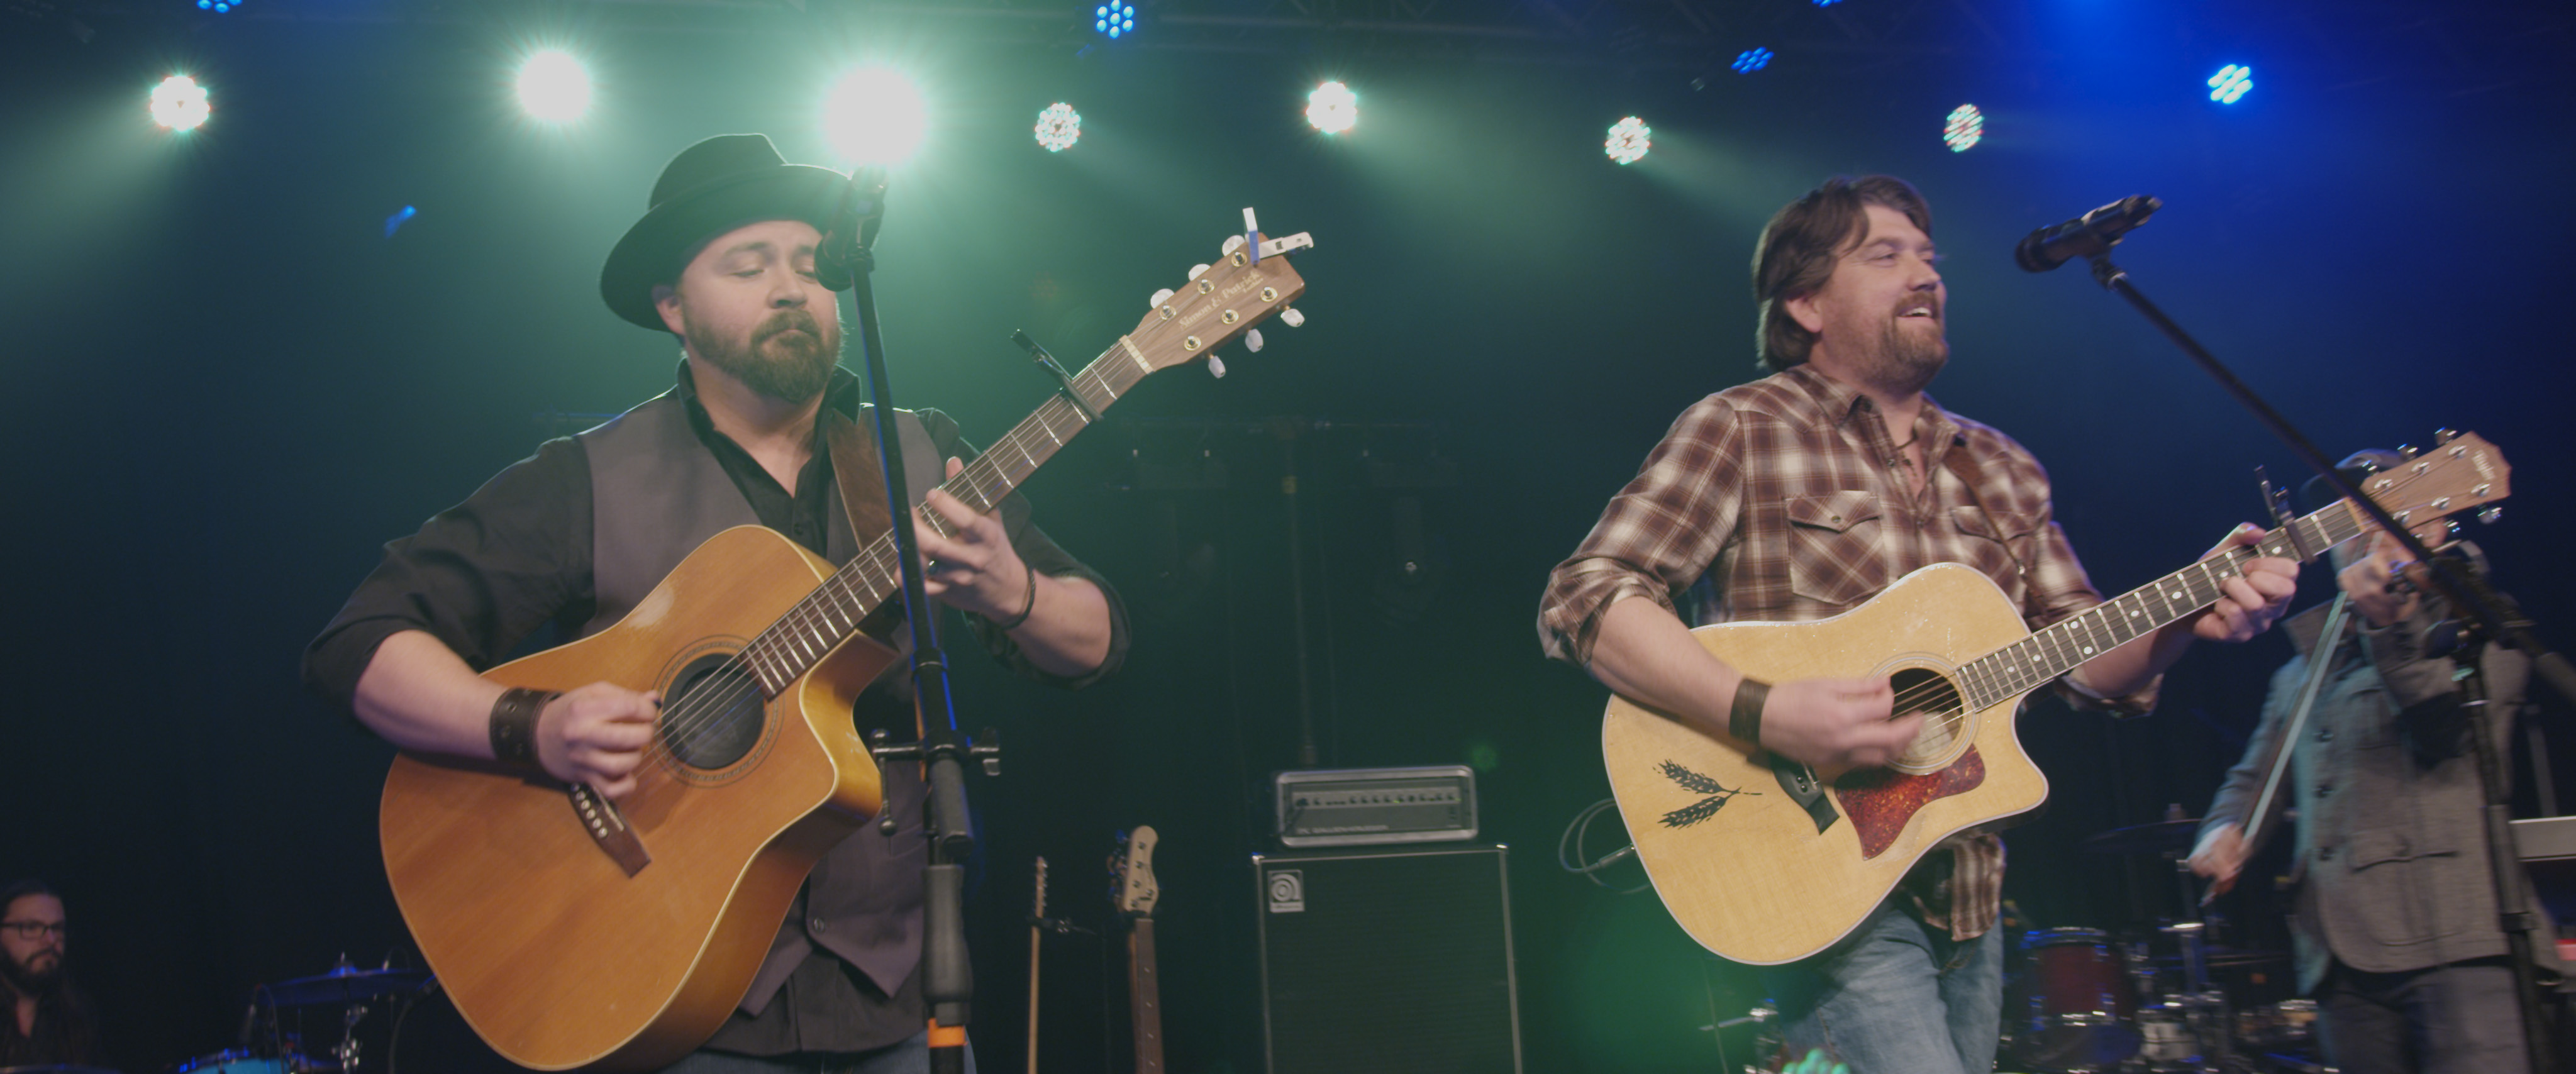 Blake Reid Band - 2017 ACMA's 08